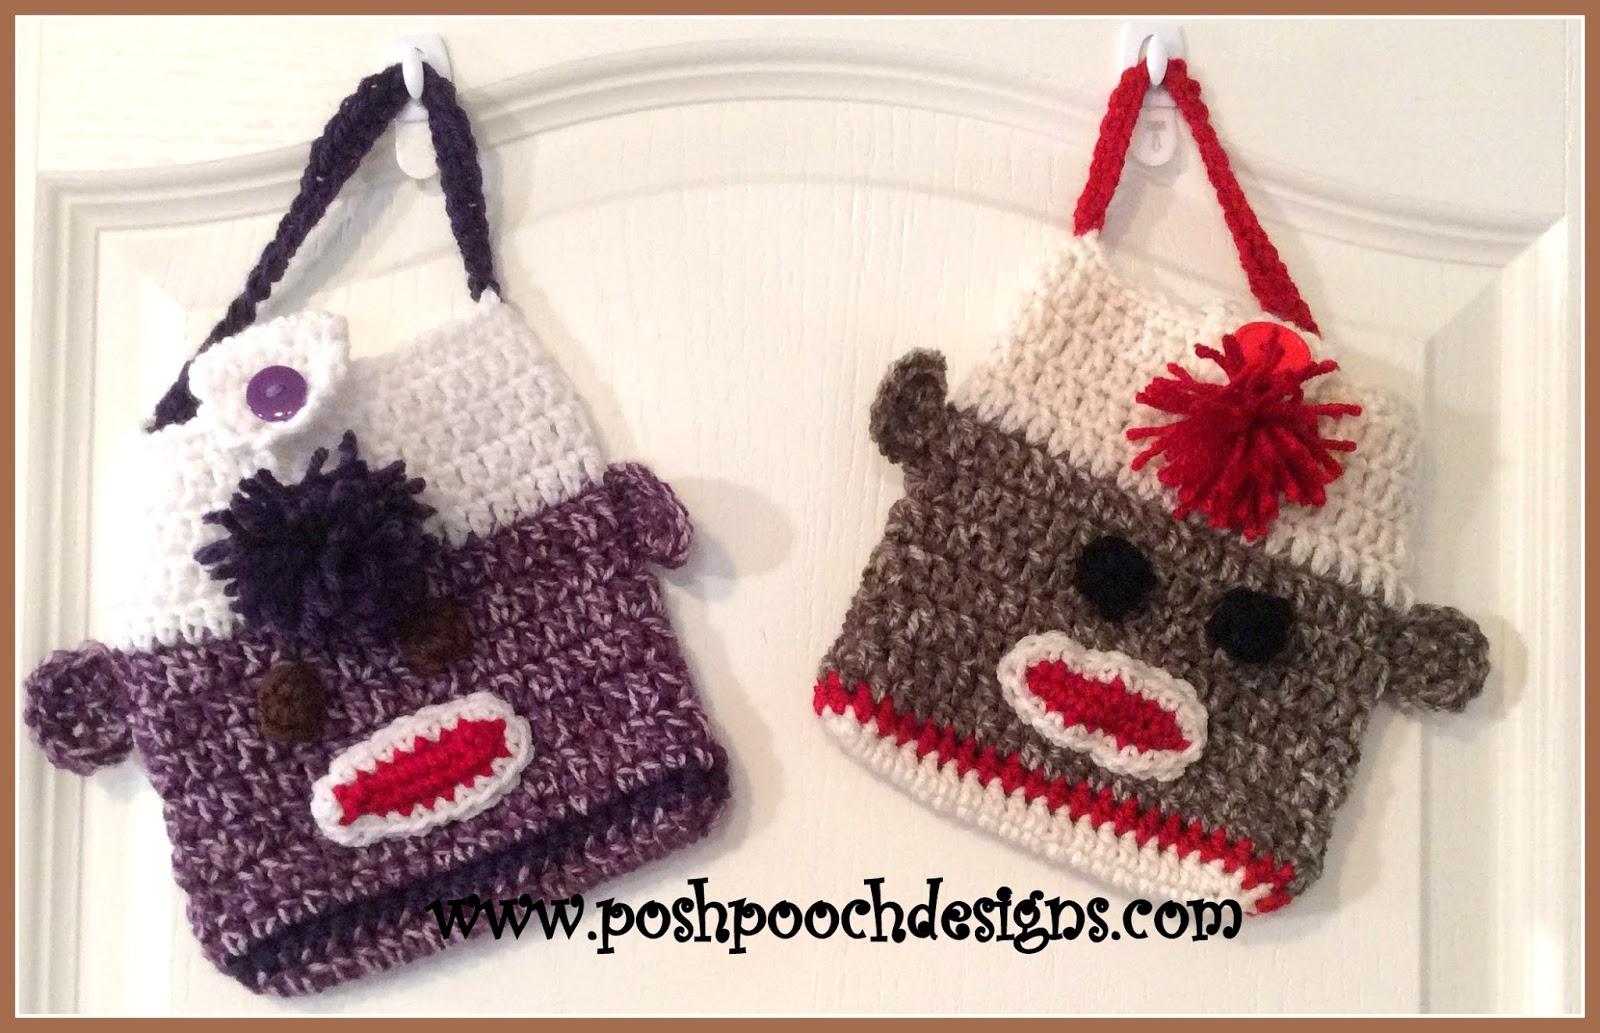 Posh Pooch Designs Dog Clothes: Sock Monkey Purse or Lunch Bag ...